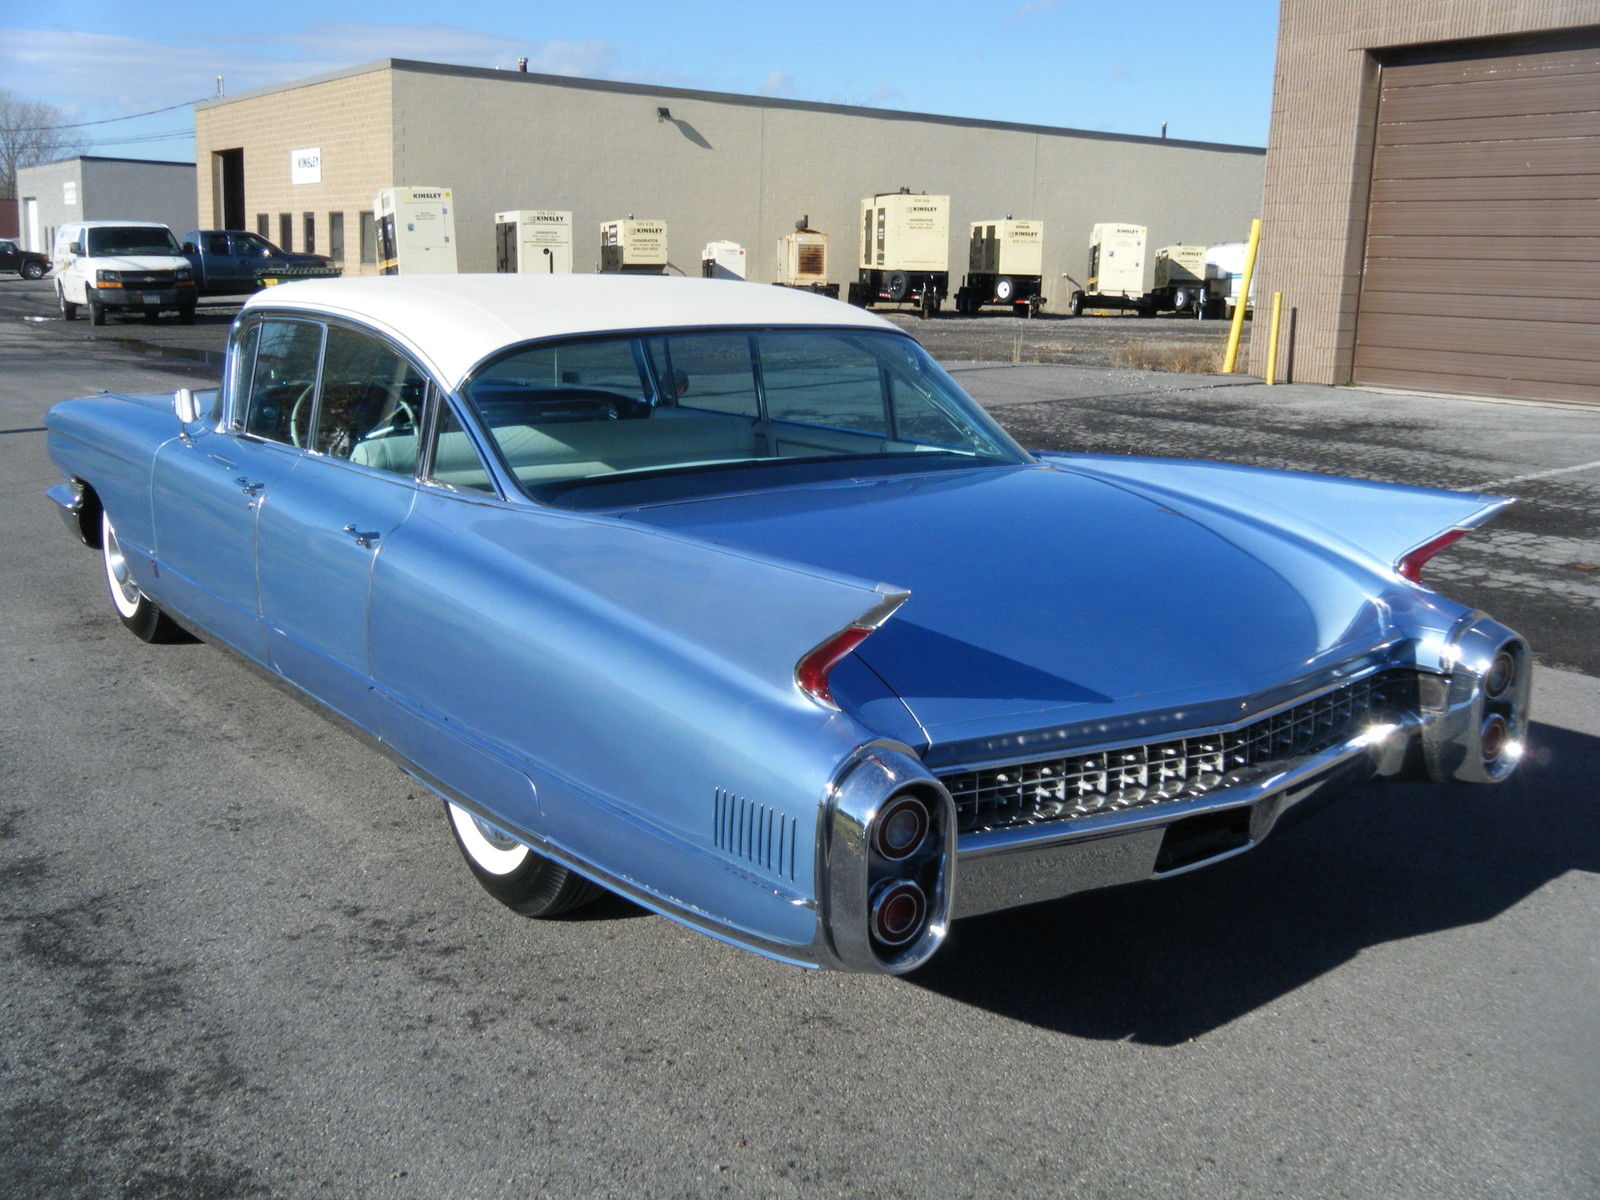 1960 Cadillac Fleetwood Rare Special Order car! listing 1951 & 1959